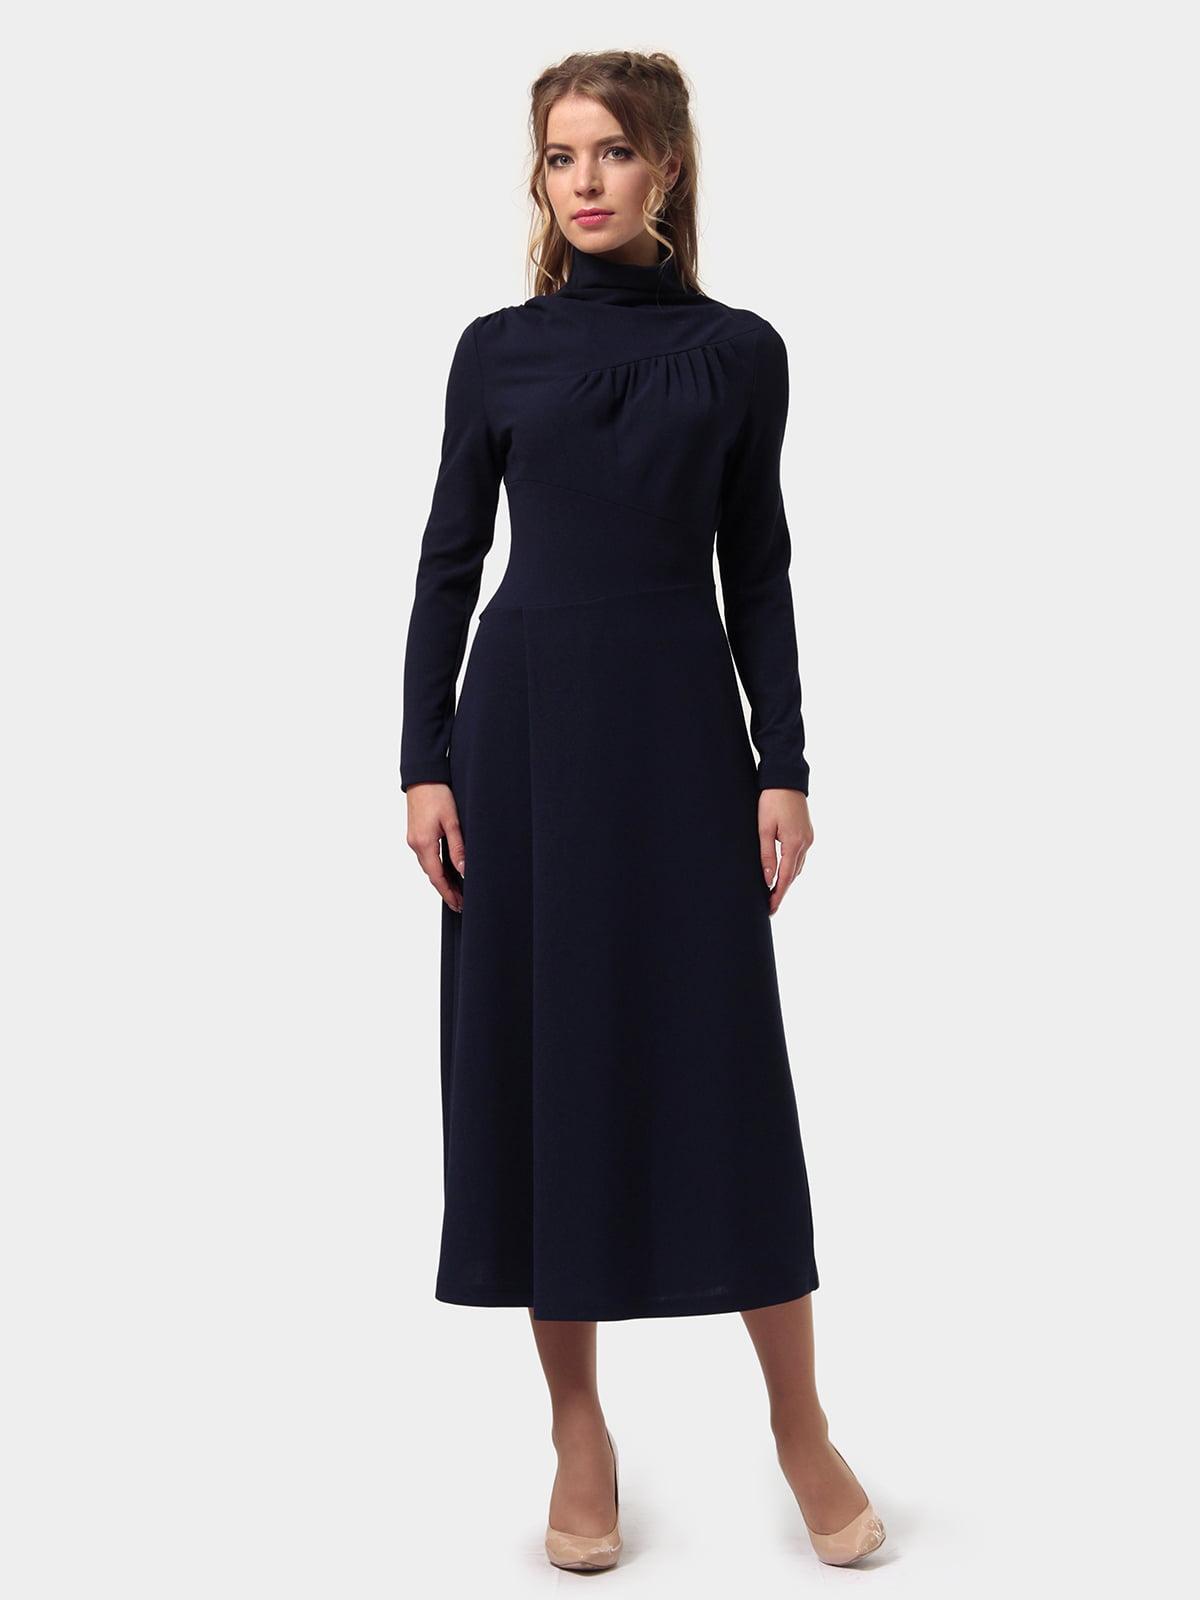 Платье темно-синее   4775706   фото 3